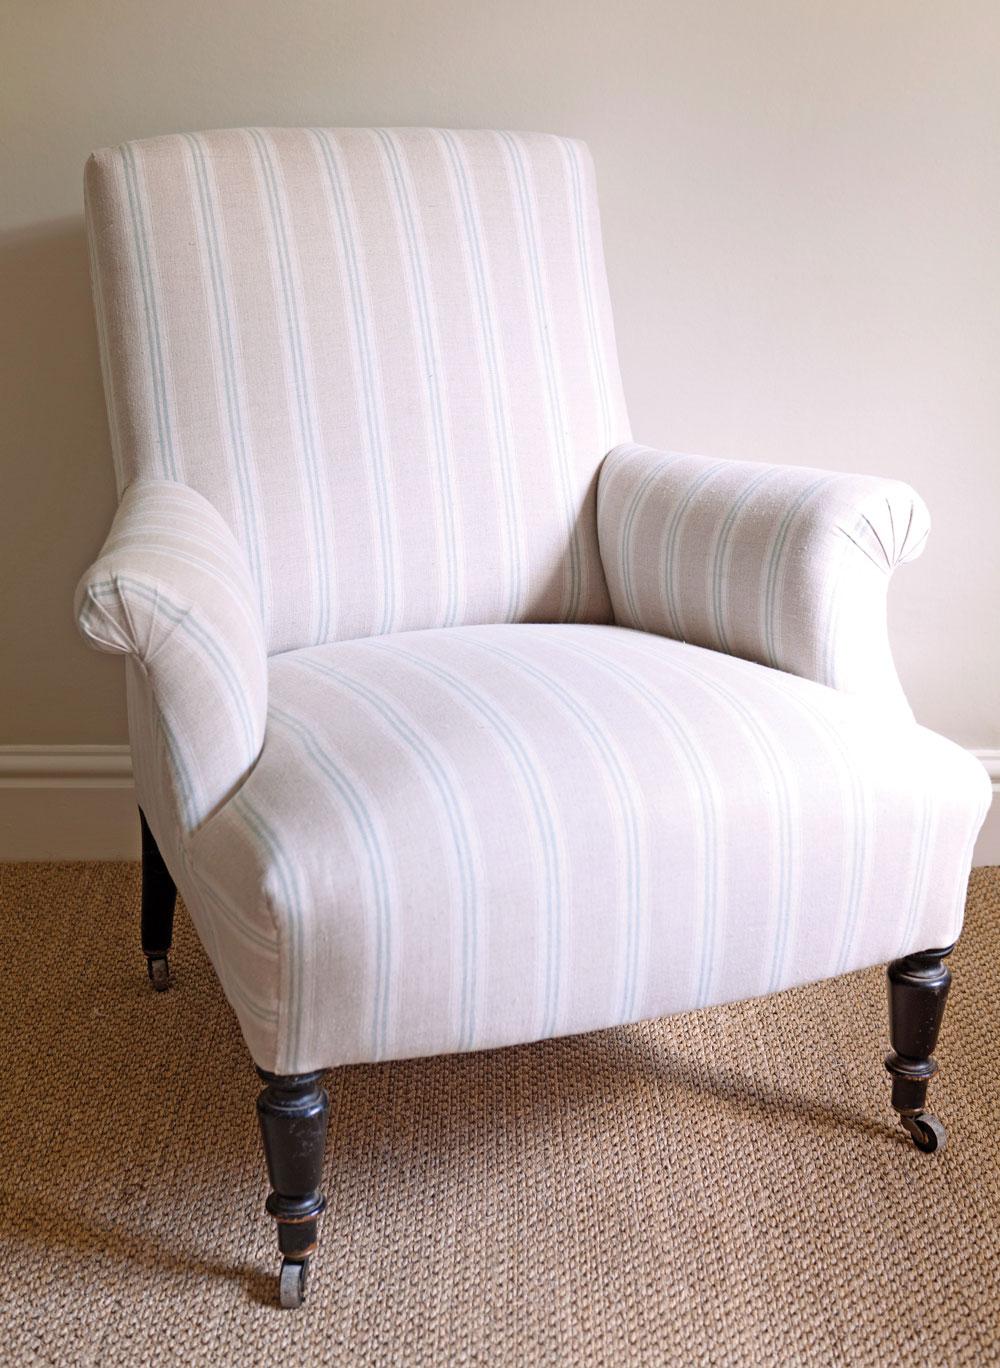 duck-egg-striped-chair